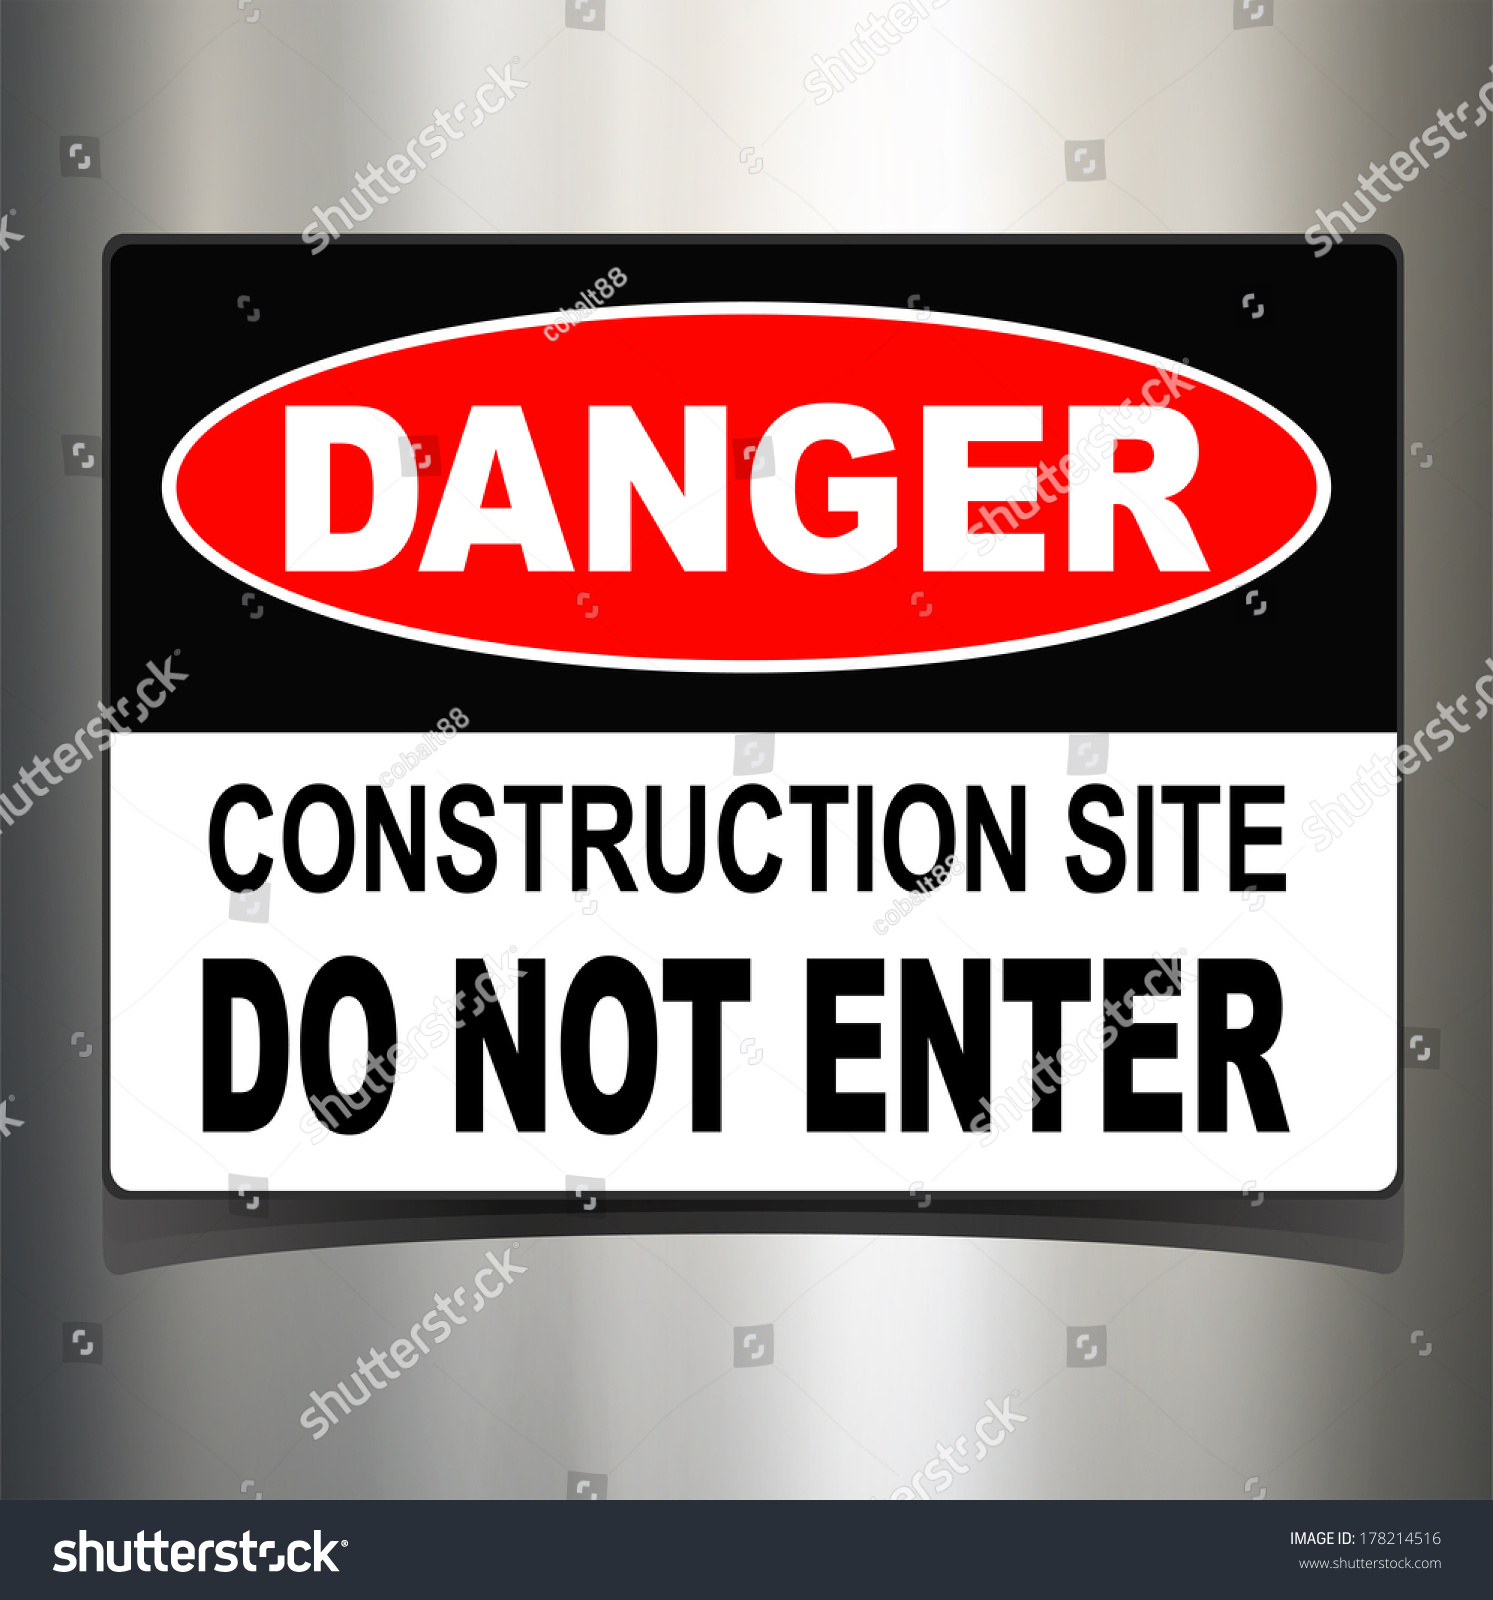 technology sign danger warning background shutterstock vector